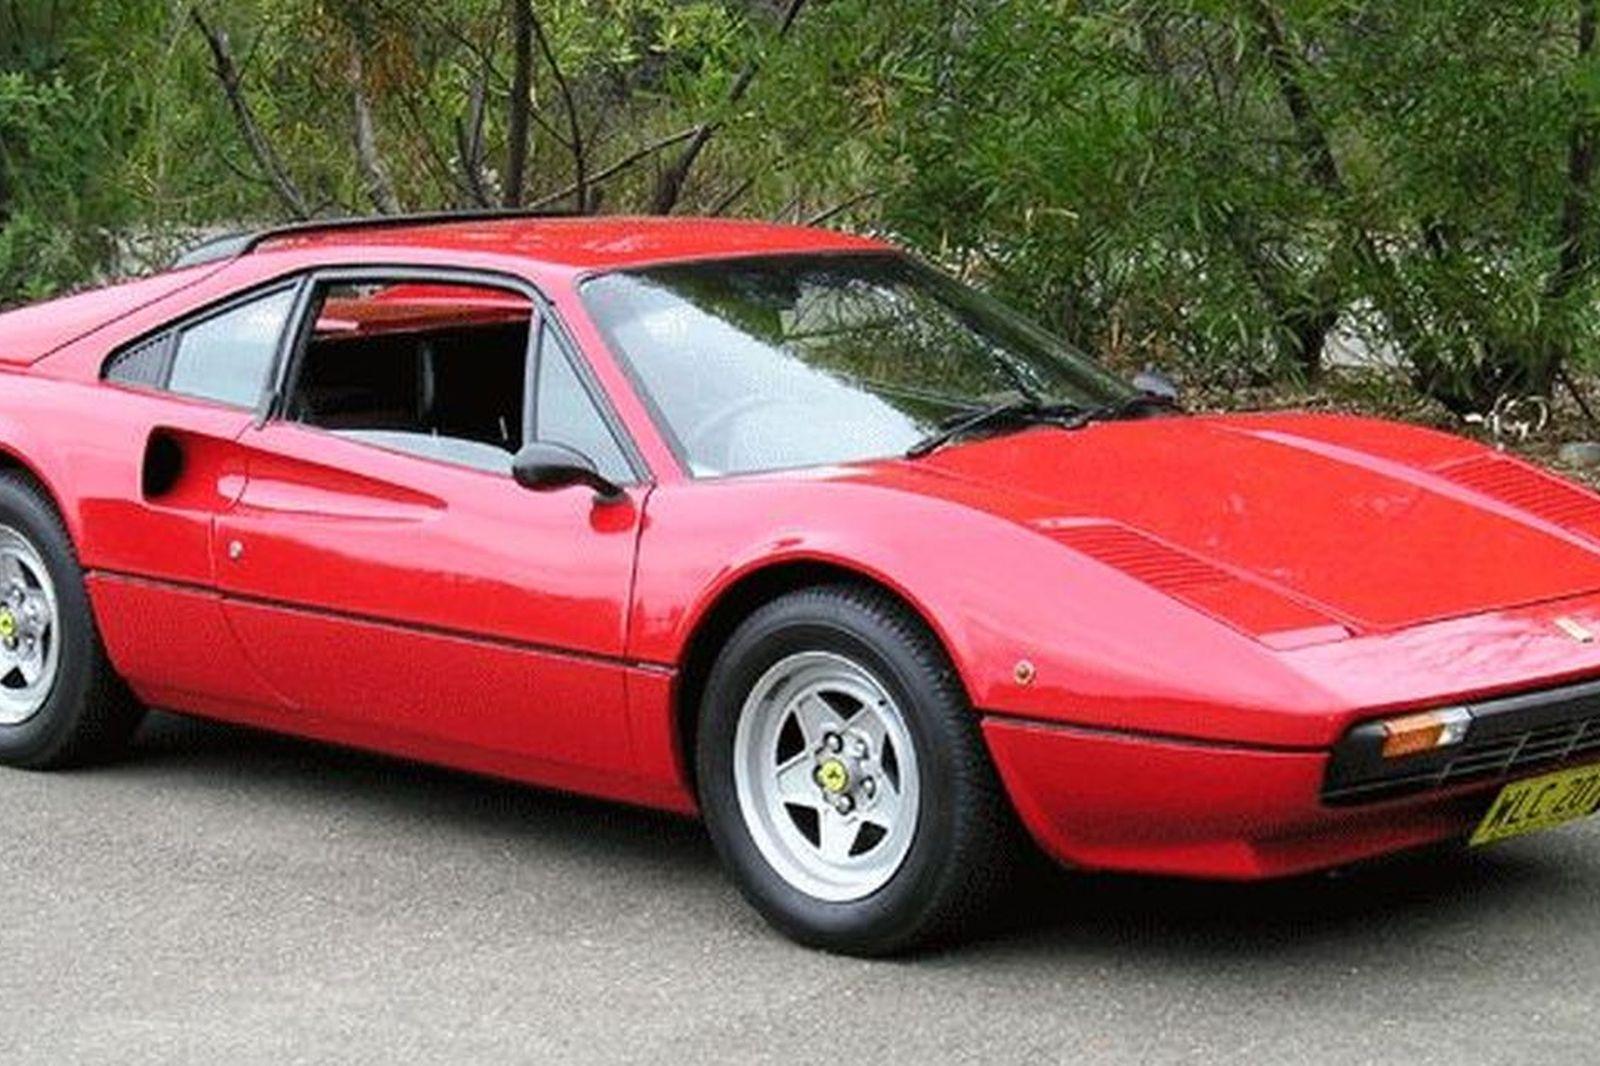 Sold Ferrari 308 Gtb Coupe Auctions Lot 17 Shannons